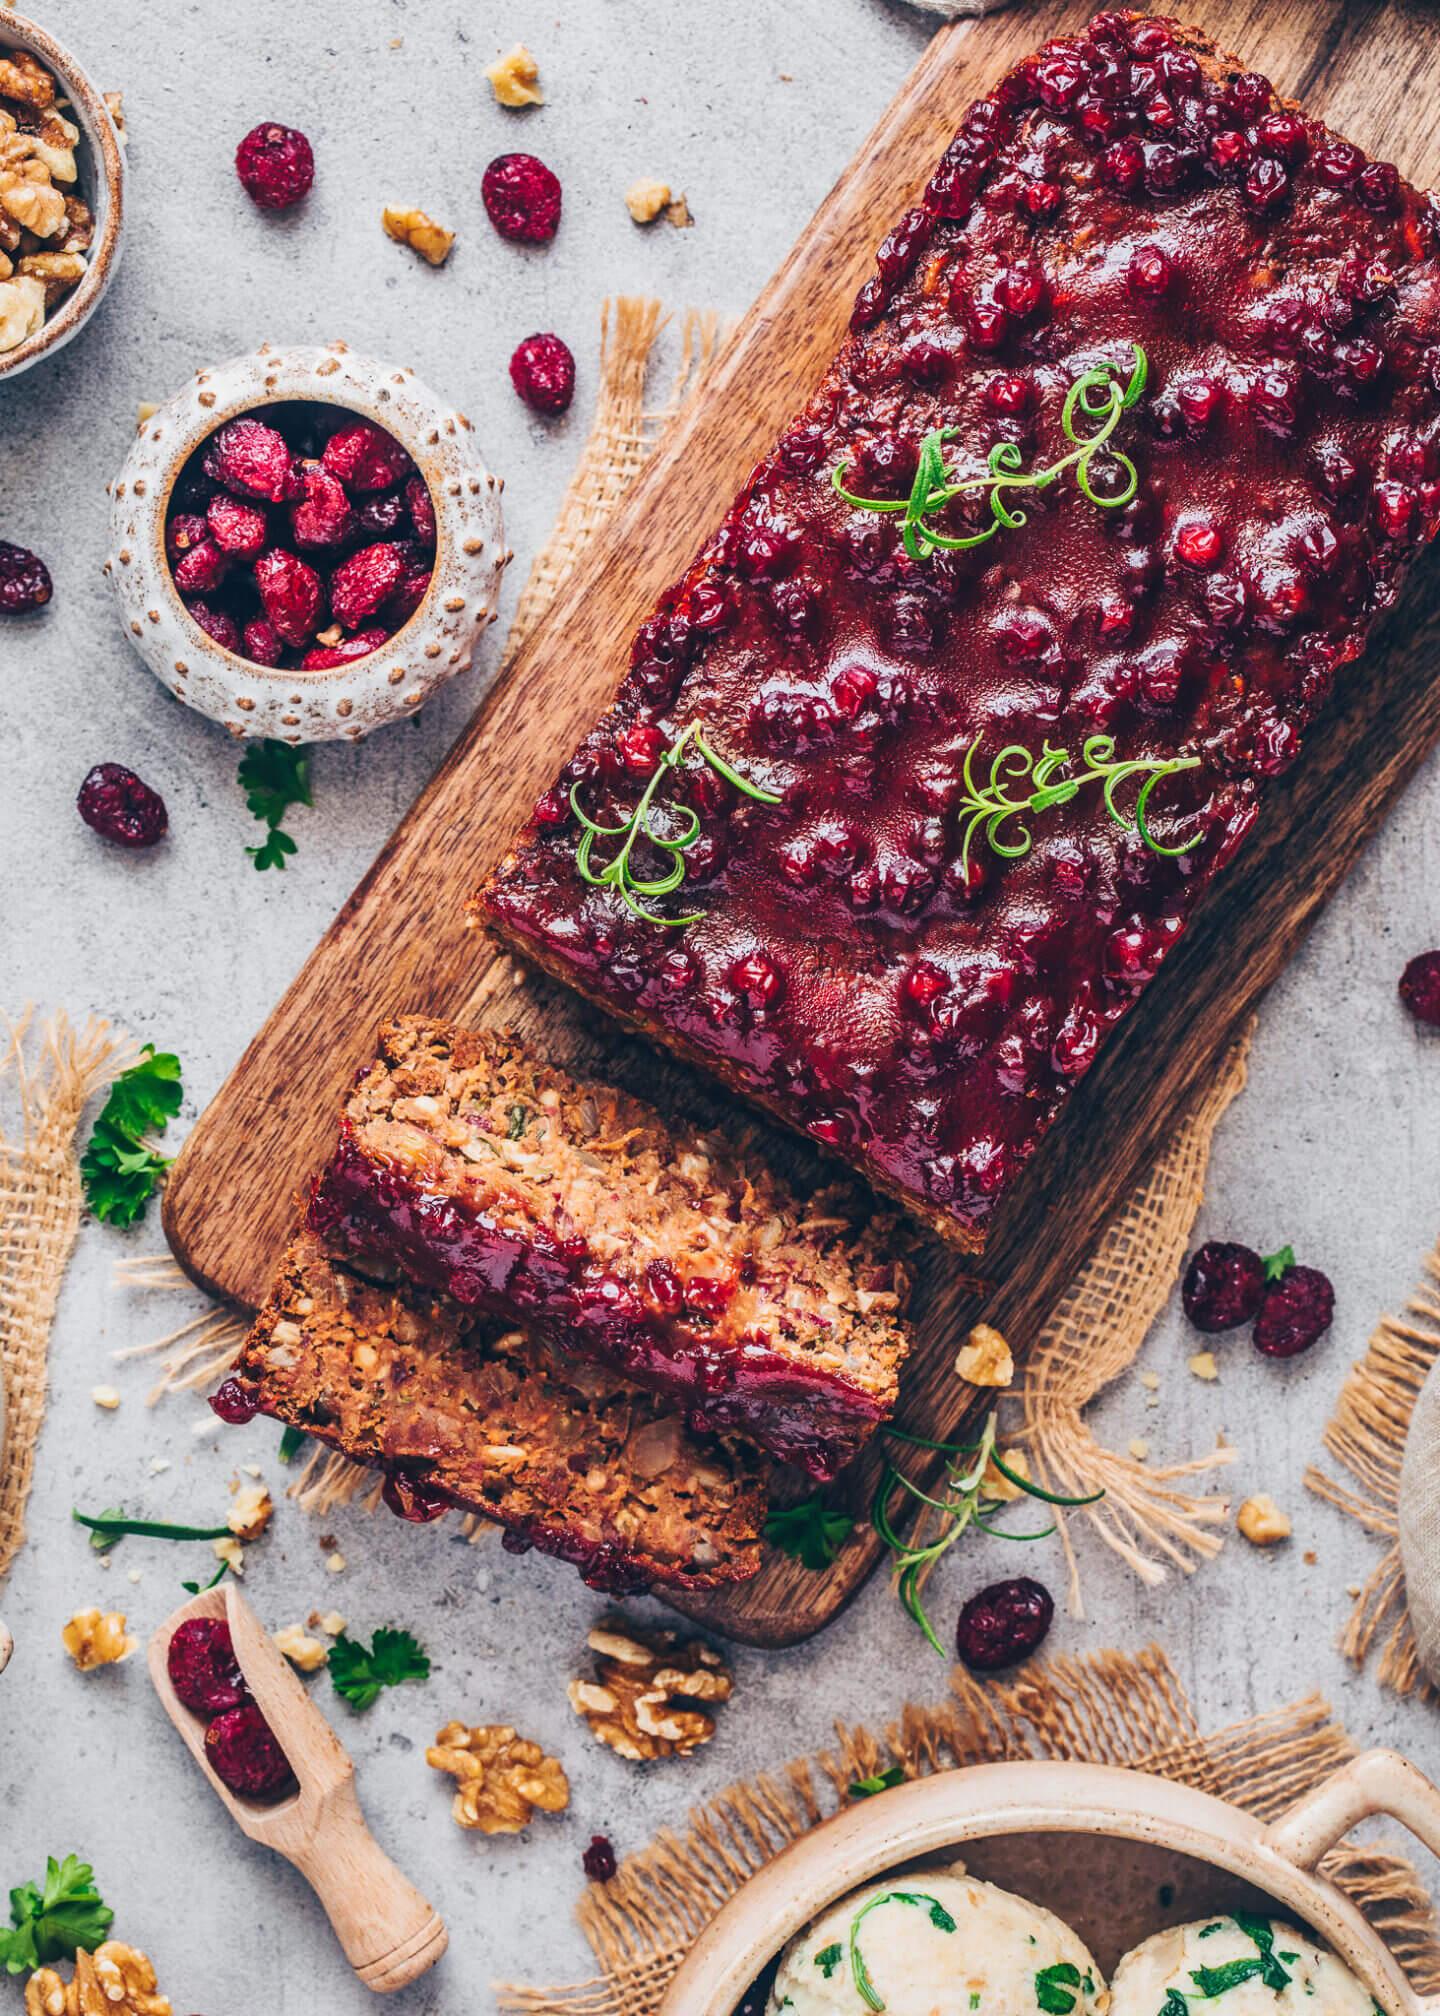 Best Vegan Meatloaf with Cranberry Chutney Glaze